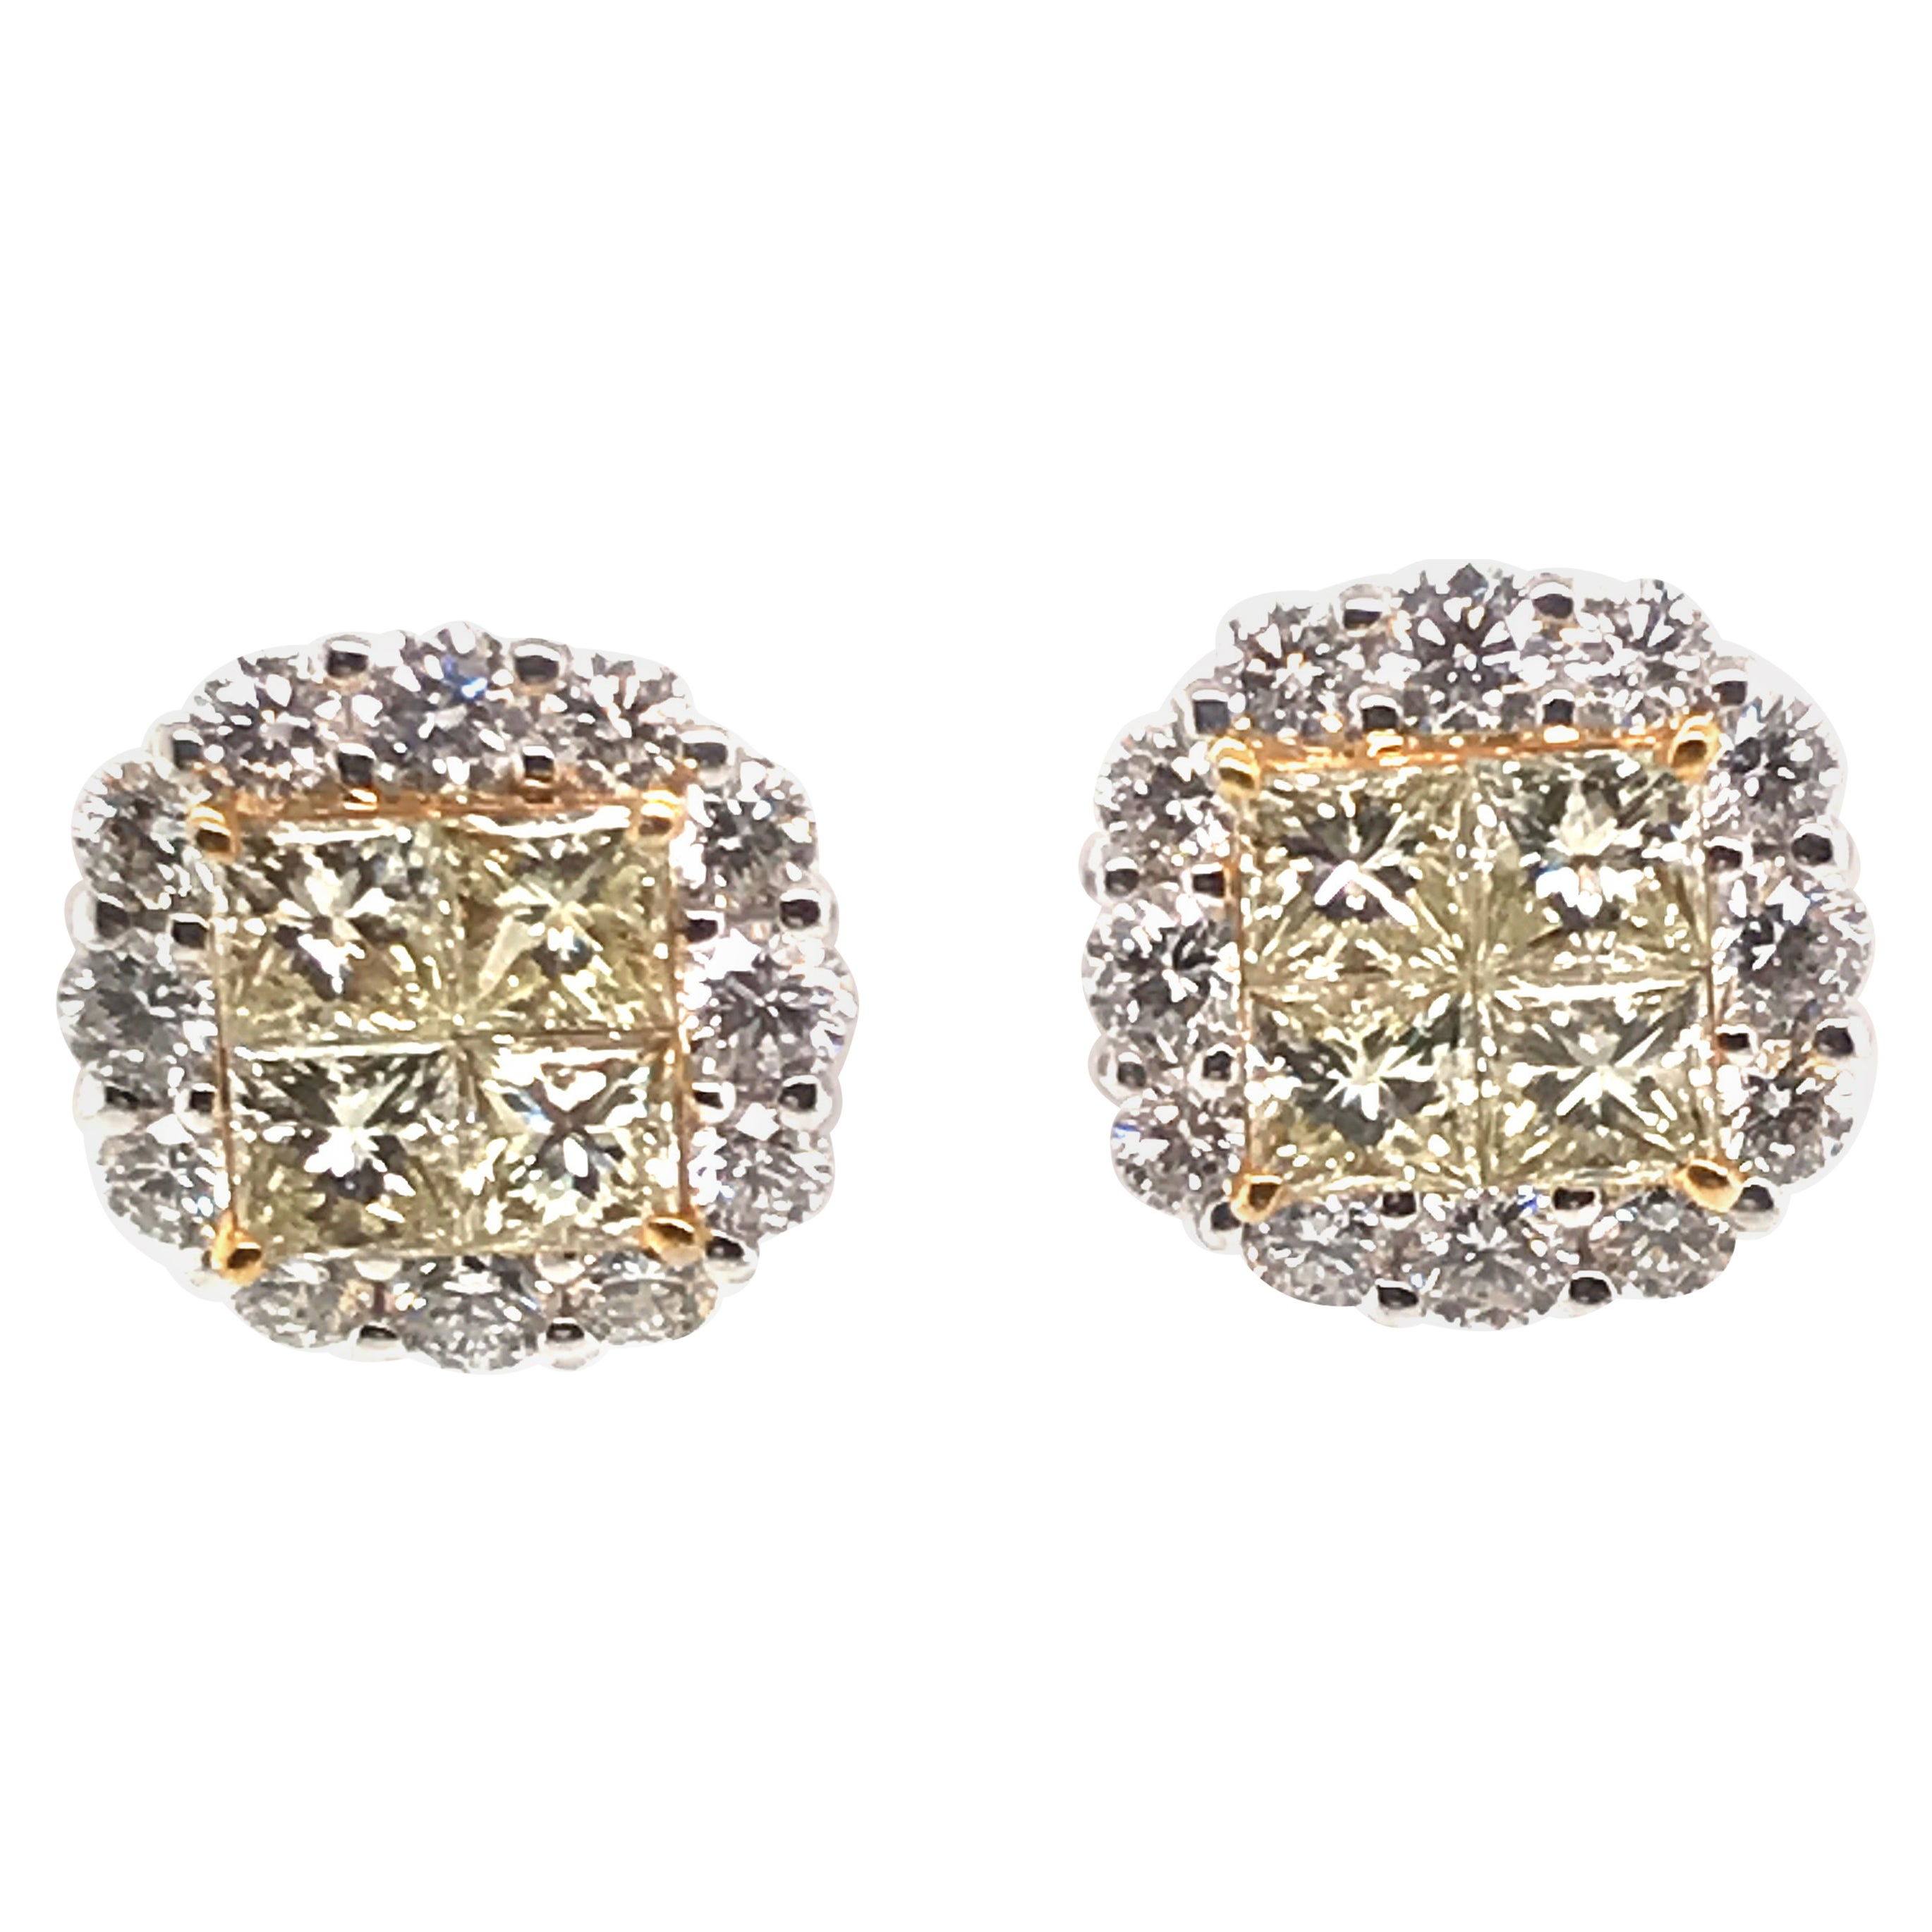 3.84 Carat Natural Fancy Yellow Diamond Cluster Earrings